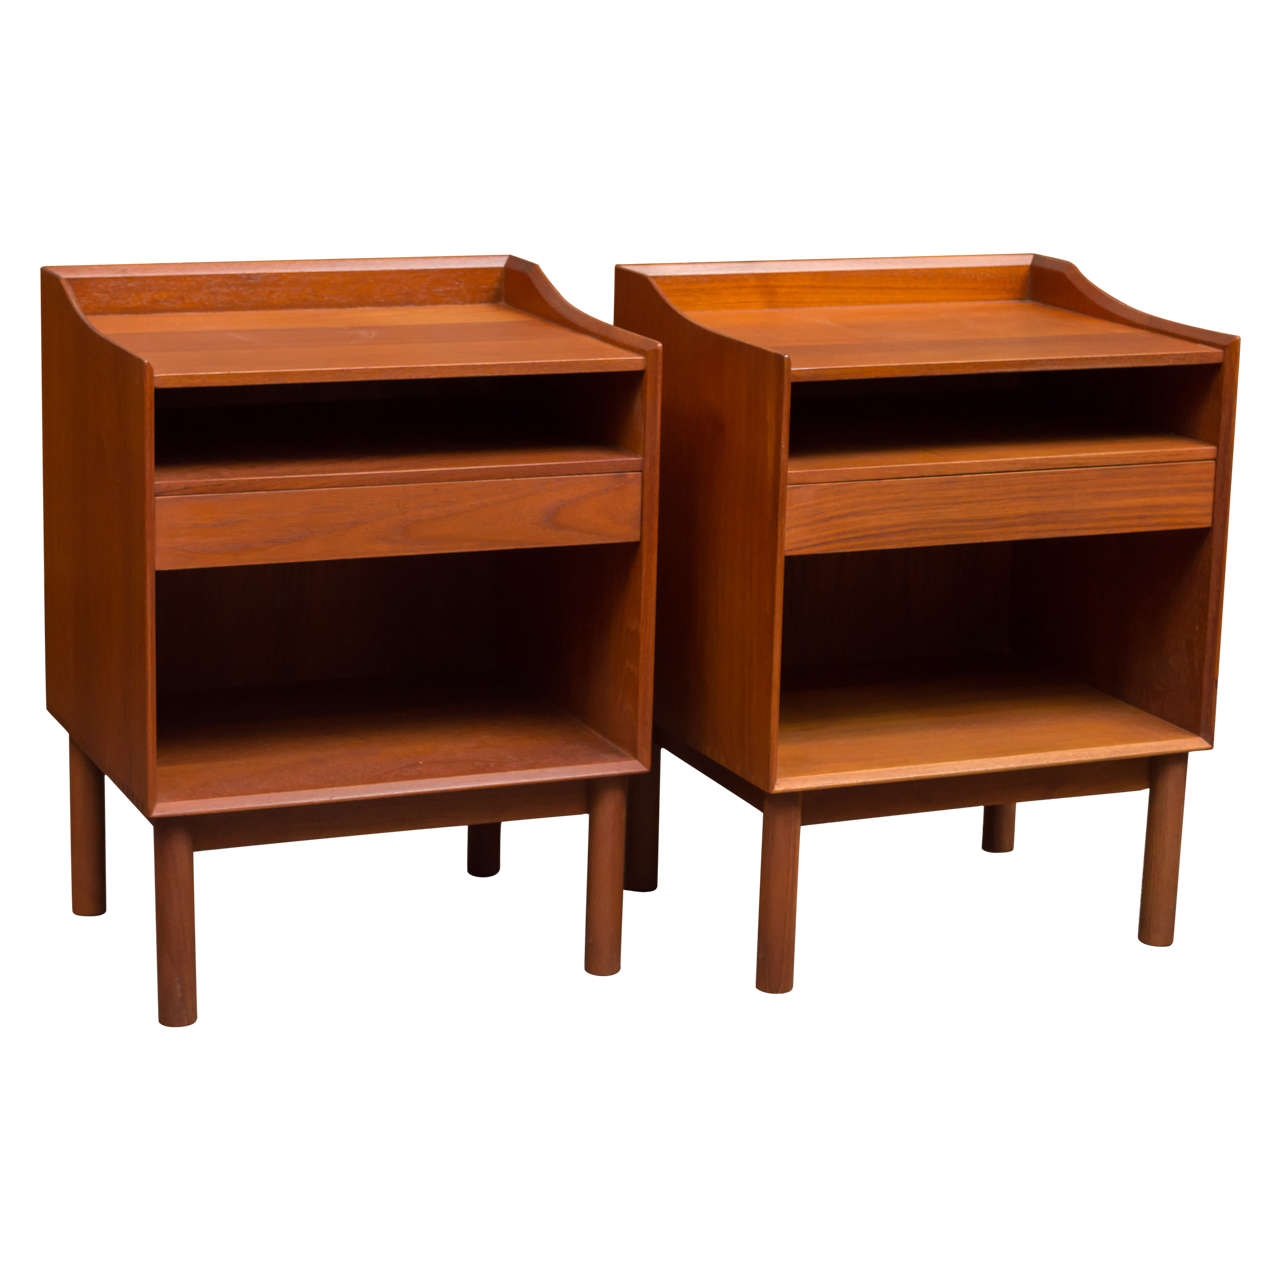 Peter hvidt and olga m lgaard nightstands for sale at 1stdibs for Bedroom furniture 94109